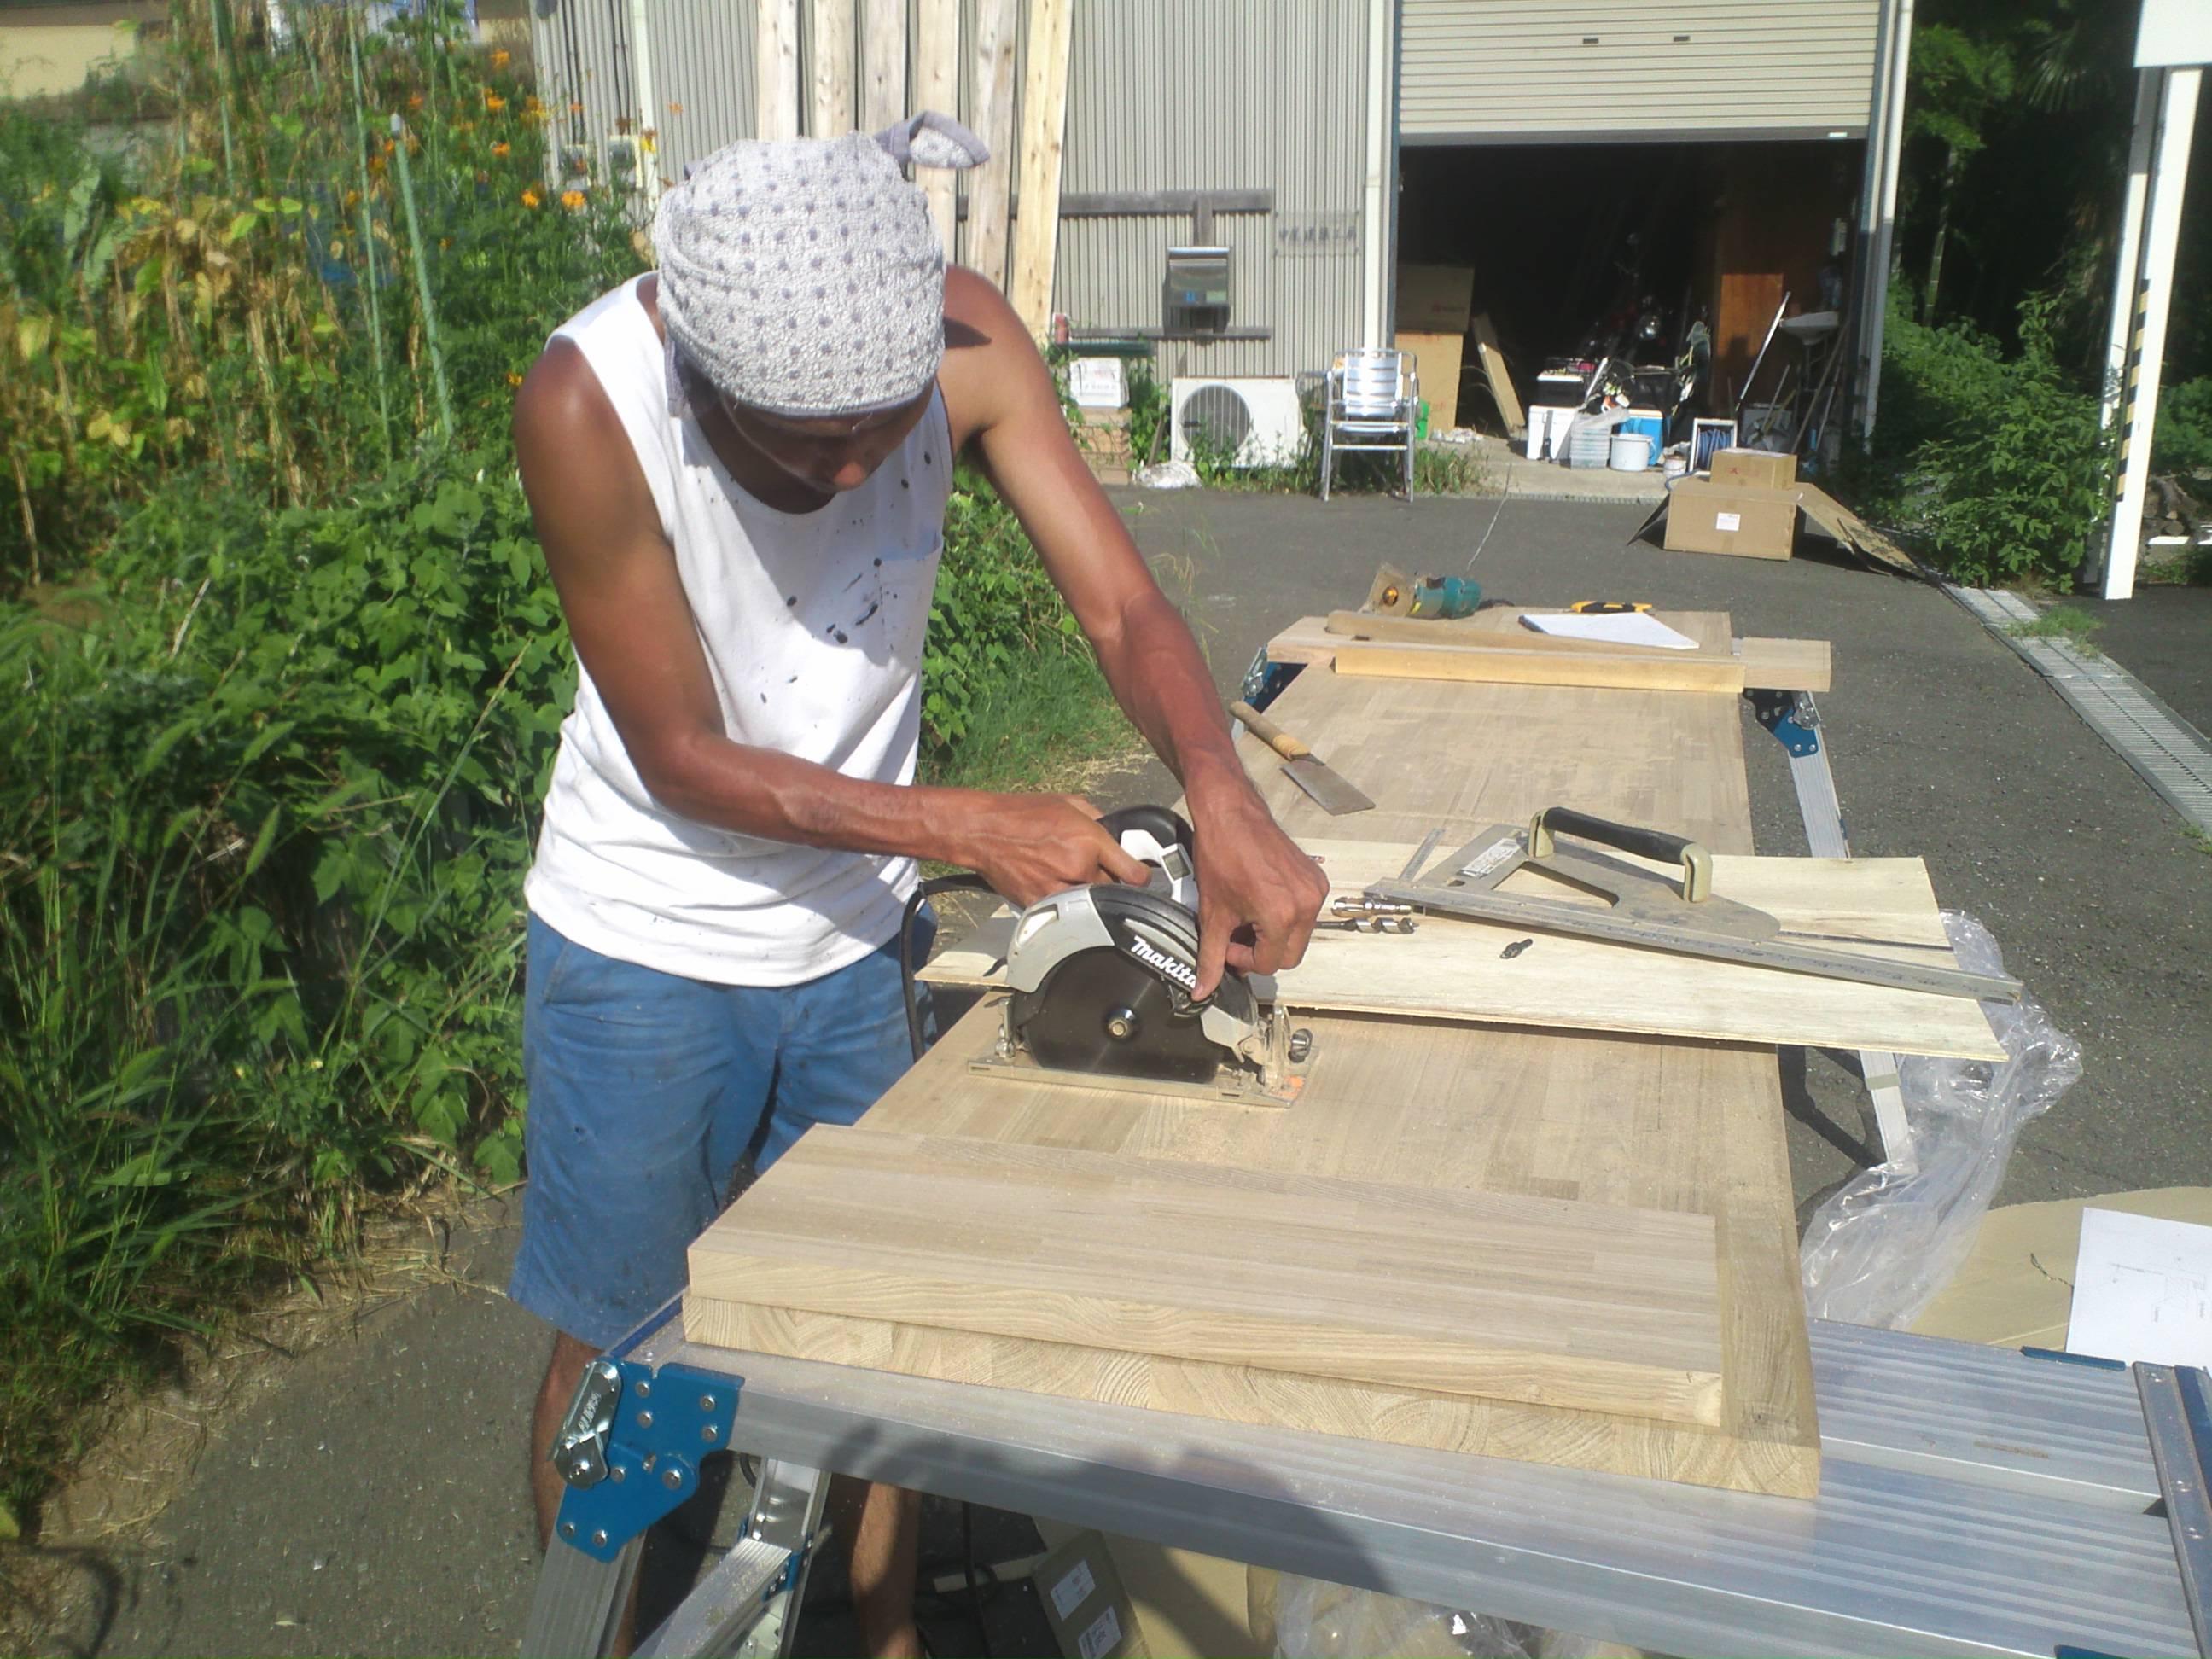 DIY作業を楽しむ!造作キッチン出来る・・・かな?!